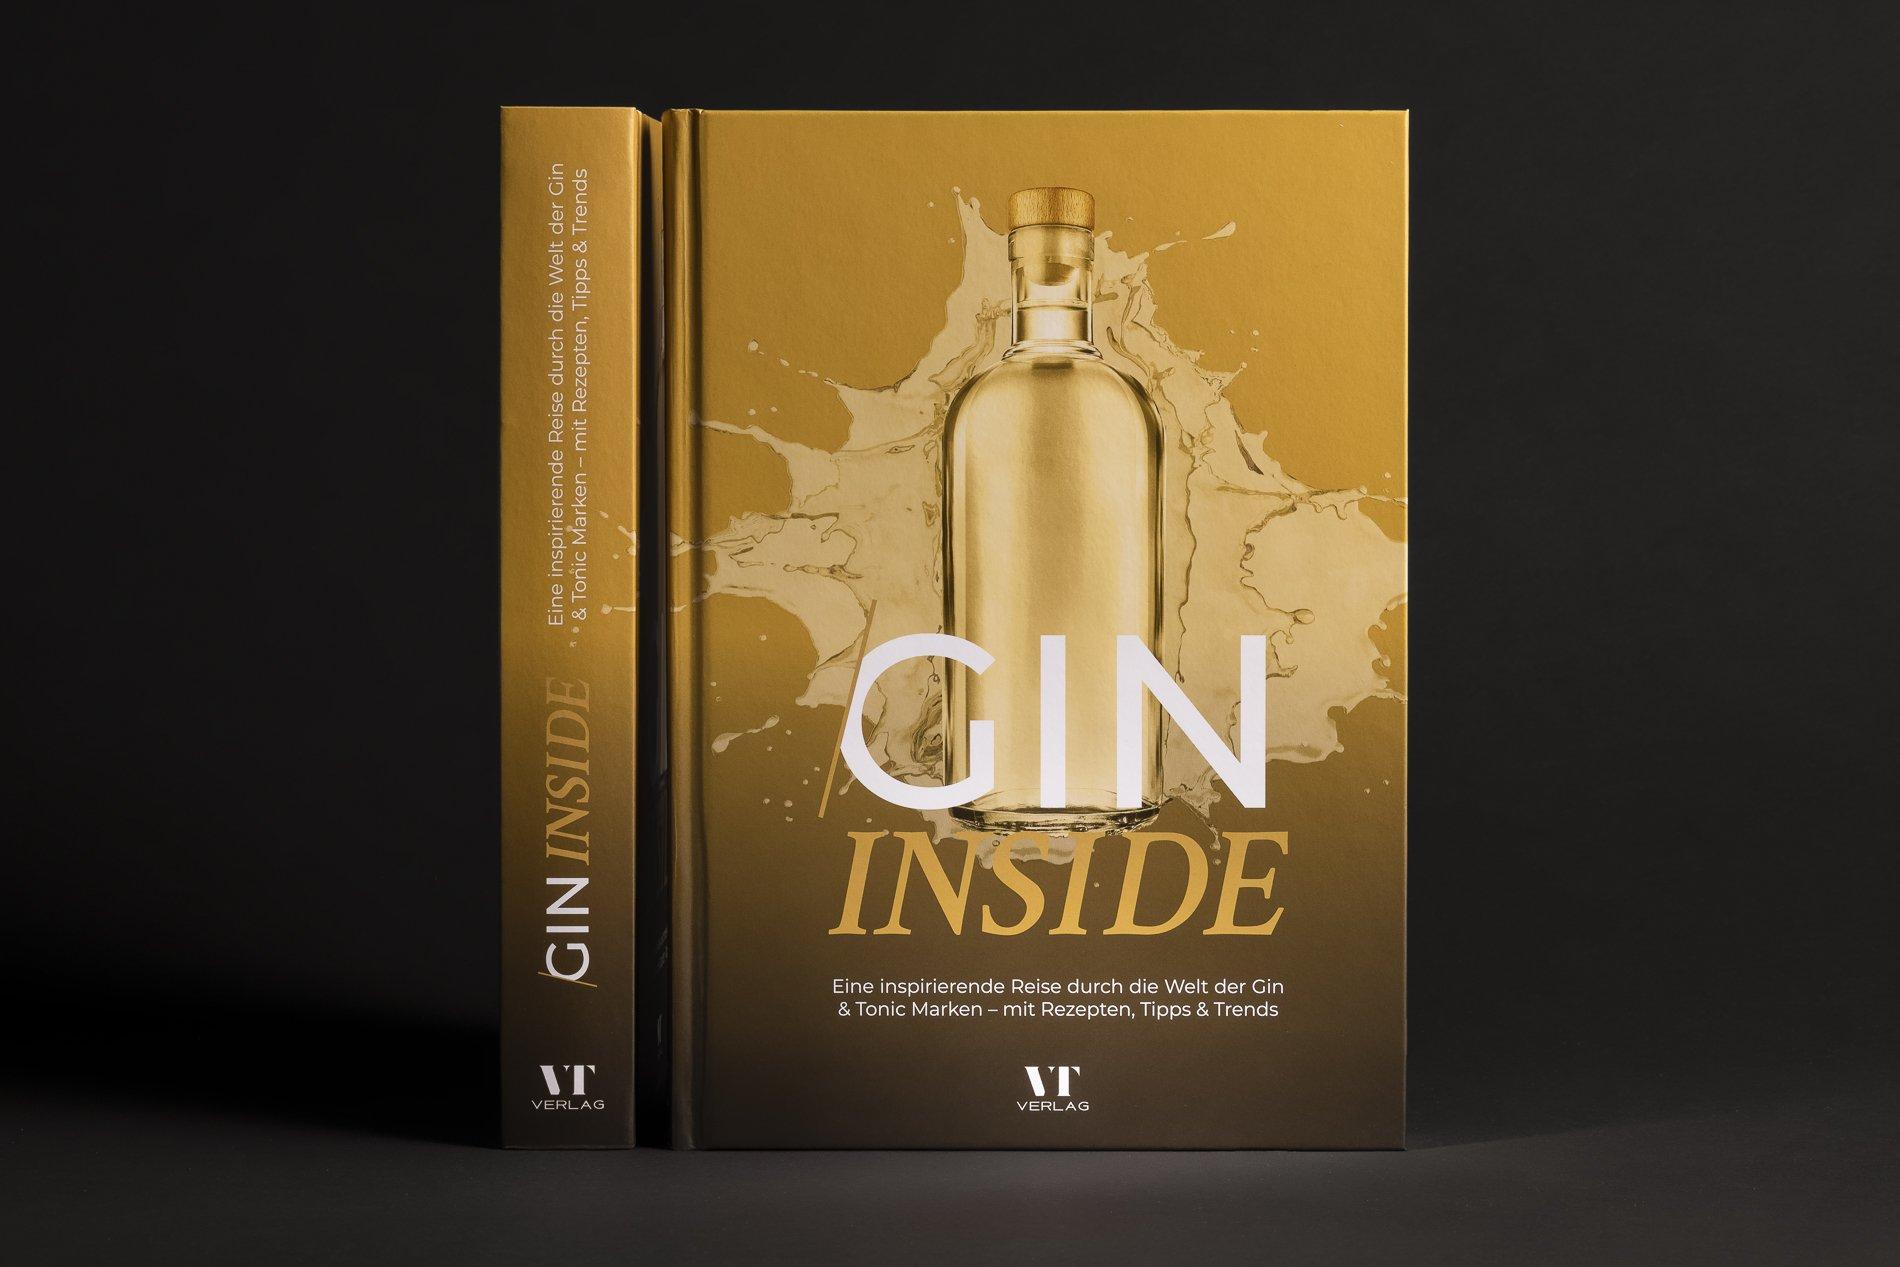 GIN INSIDE BUCH